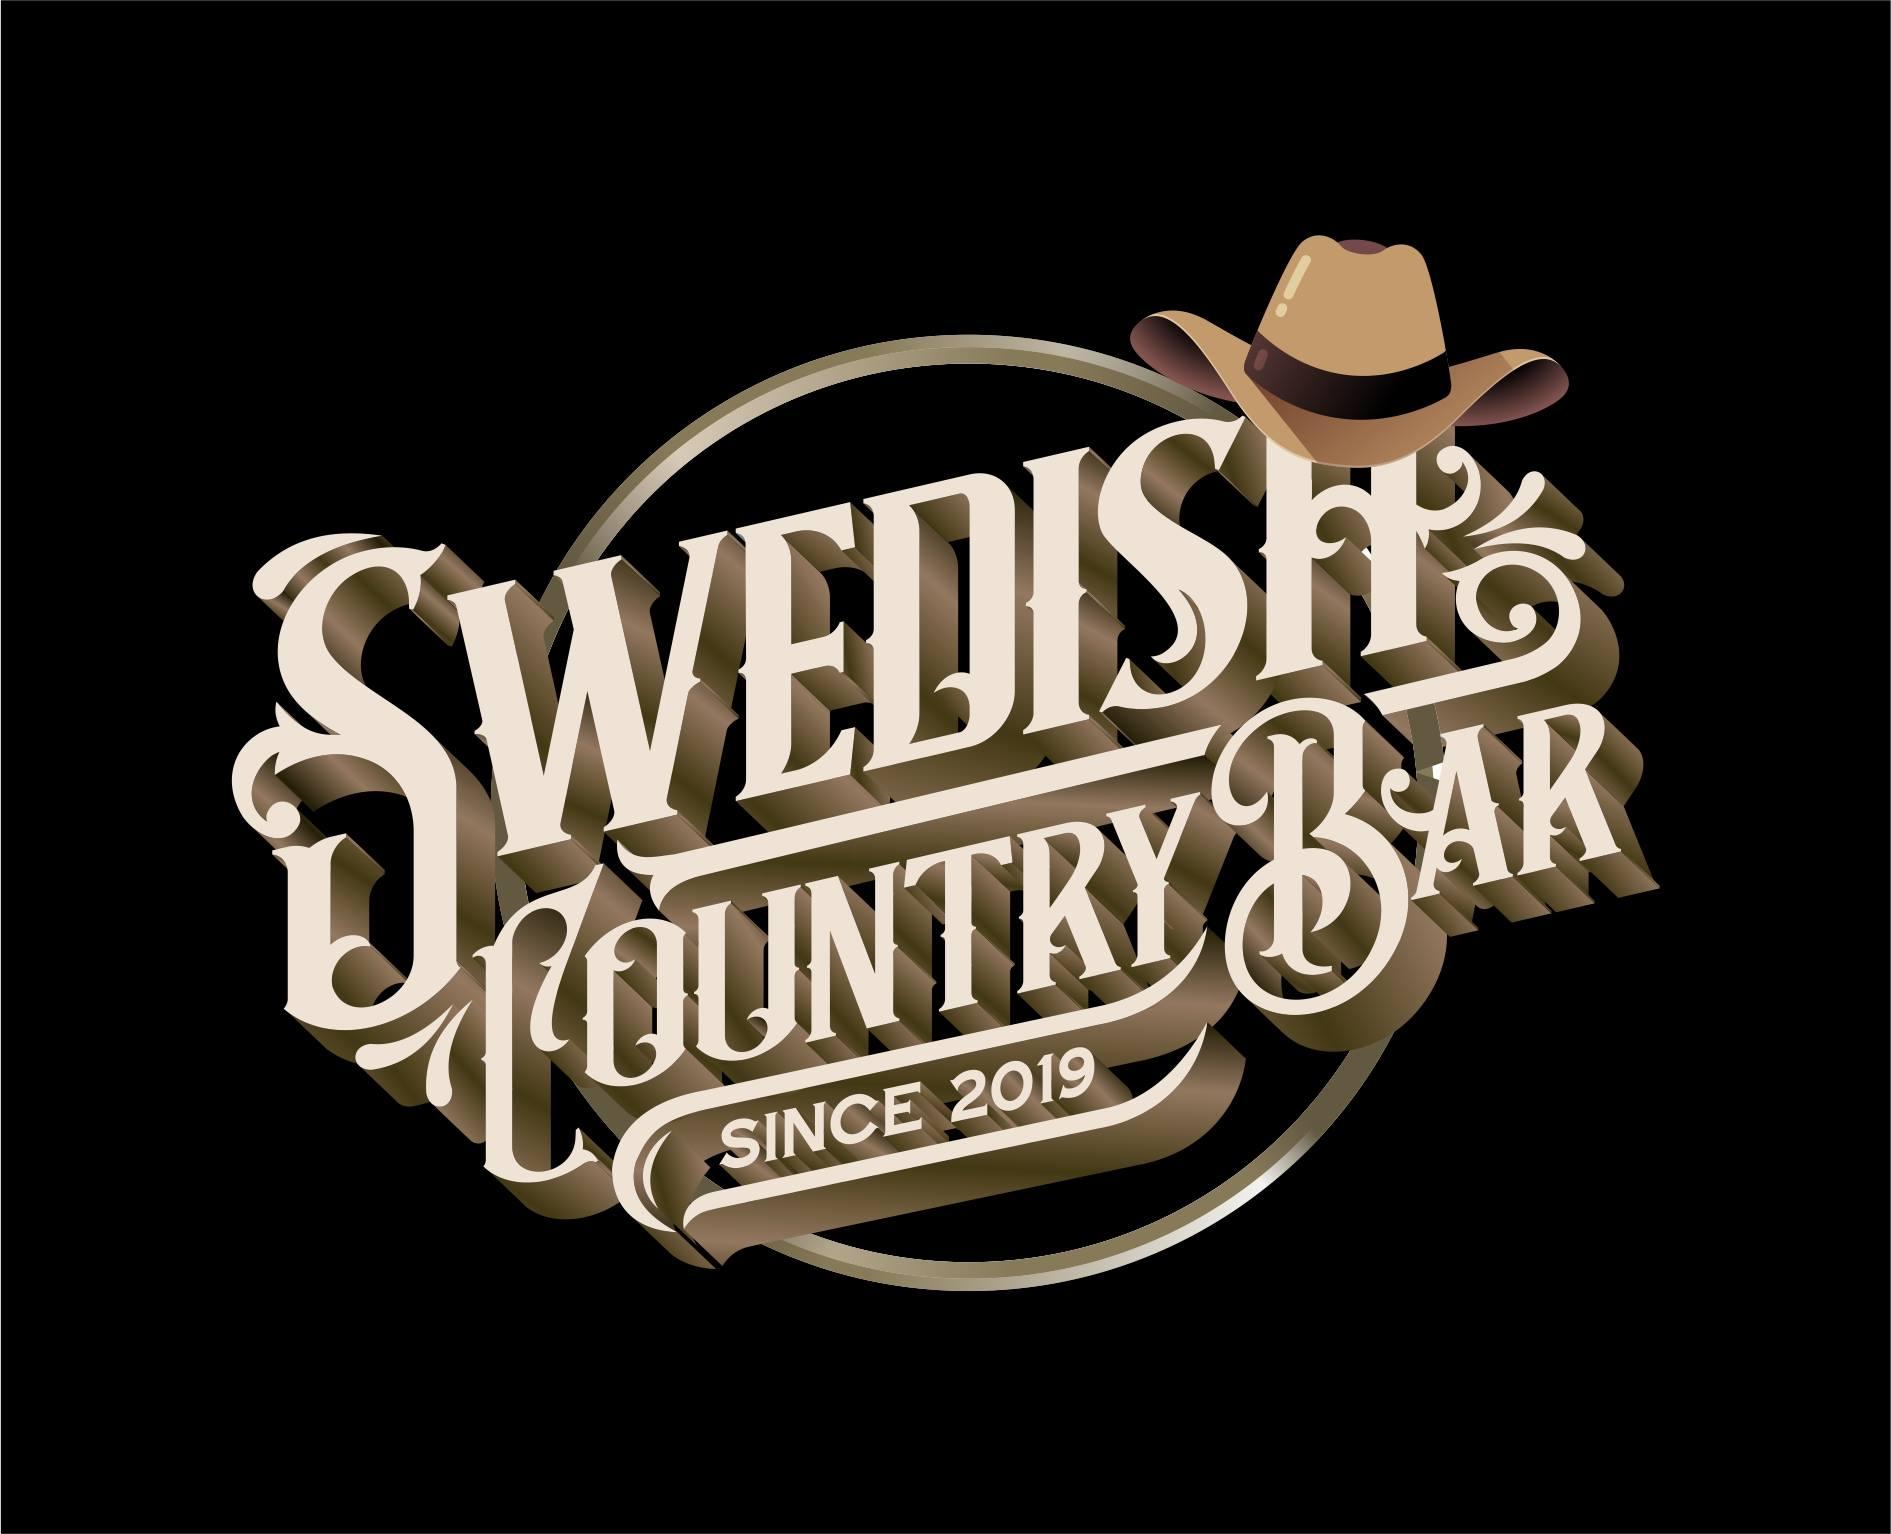 Swedish Country Bar